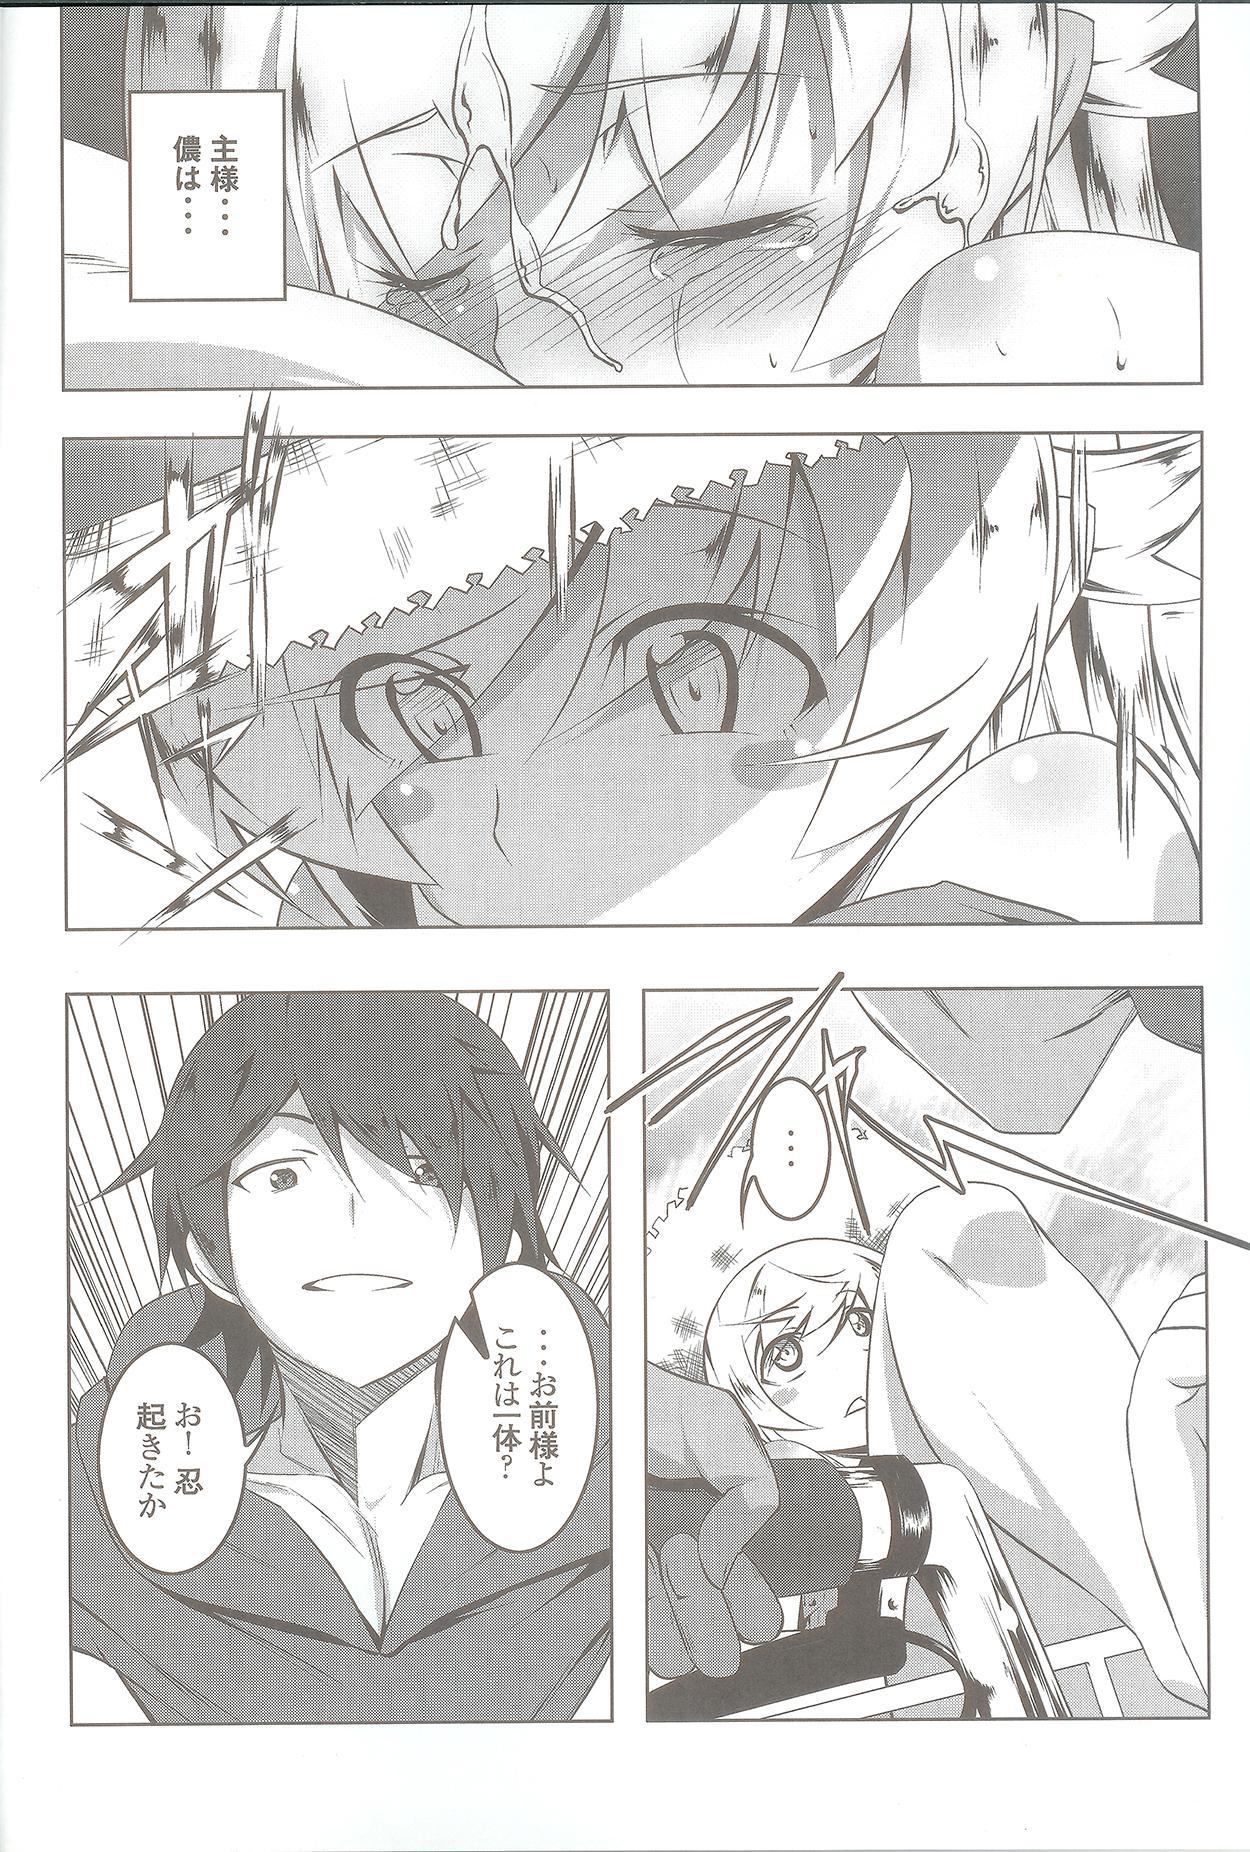 Netoraregatari San 3